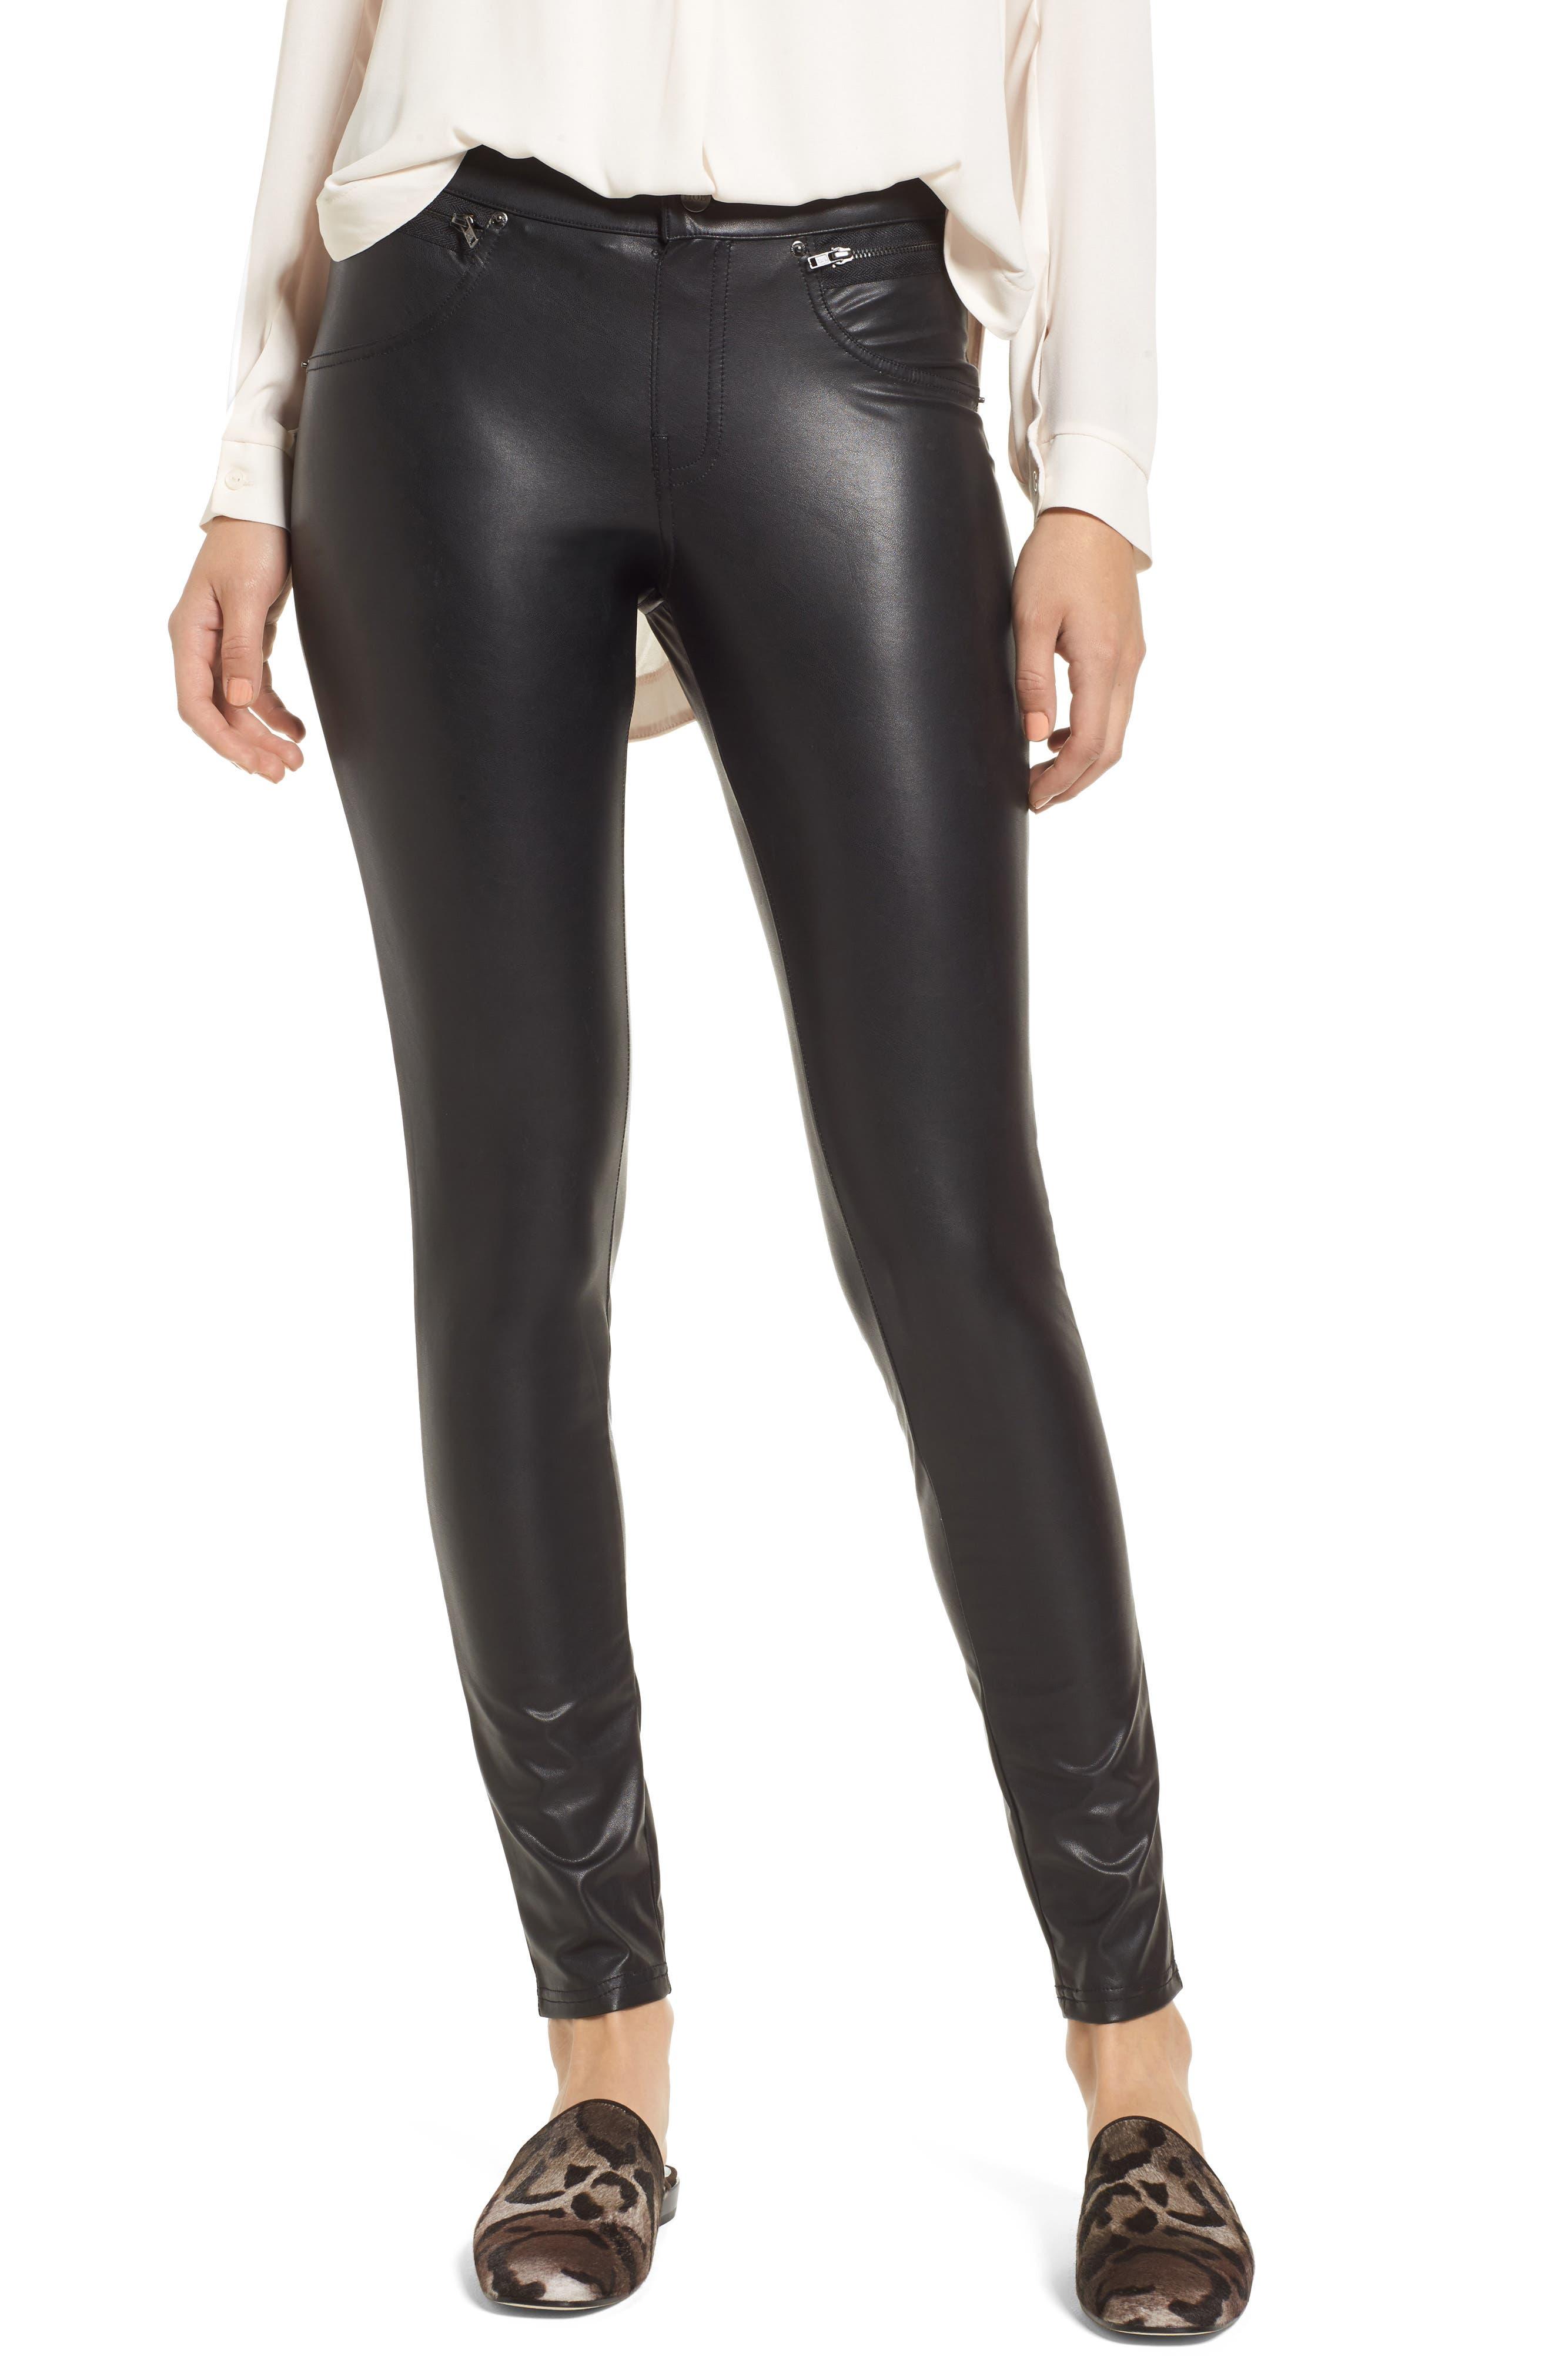 Hue Leatherette Leggings